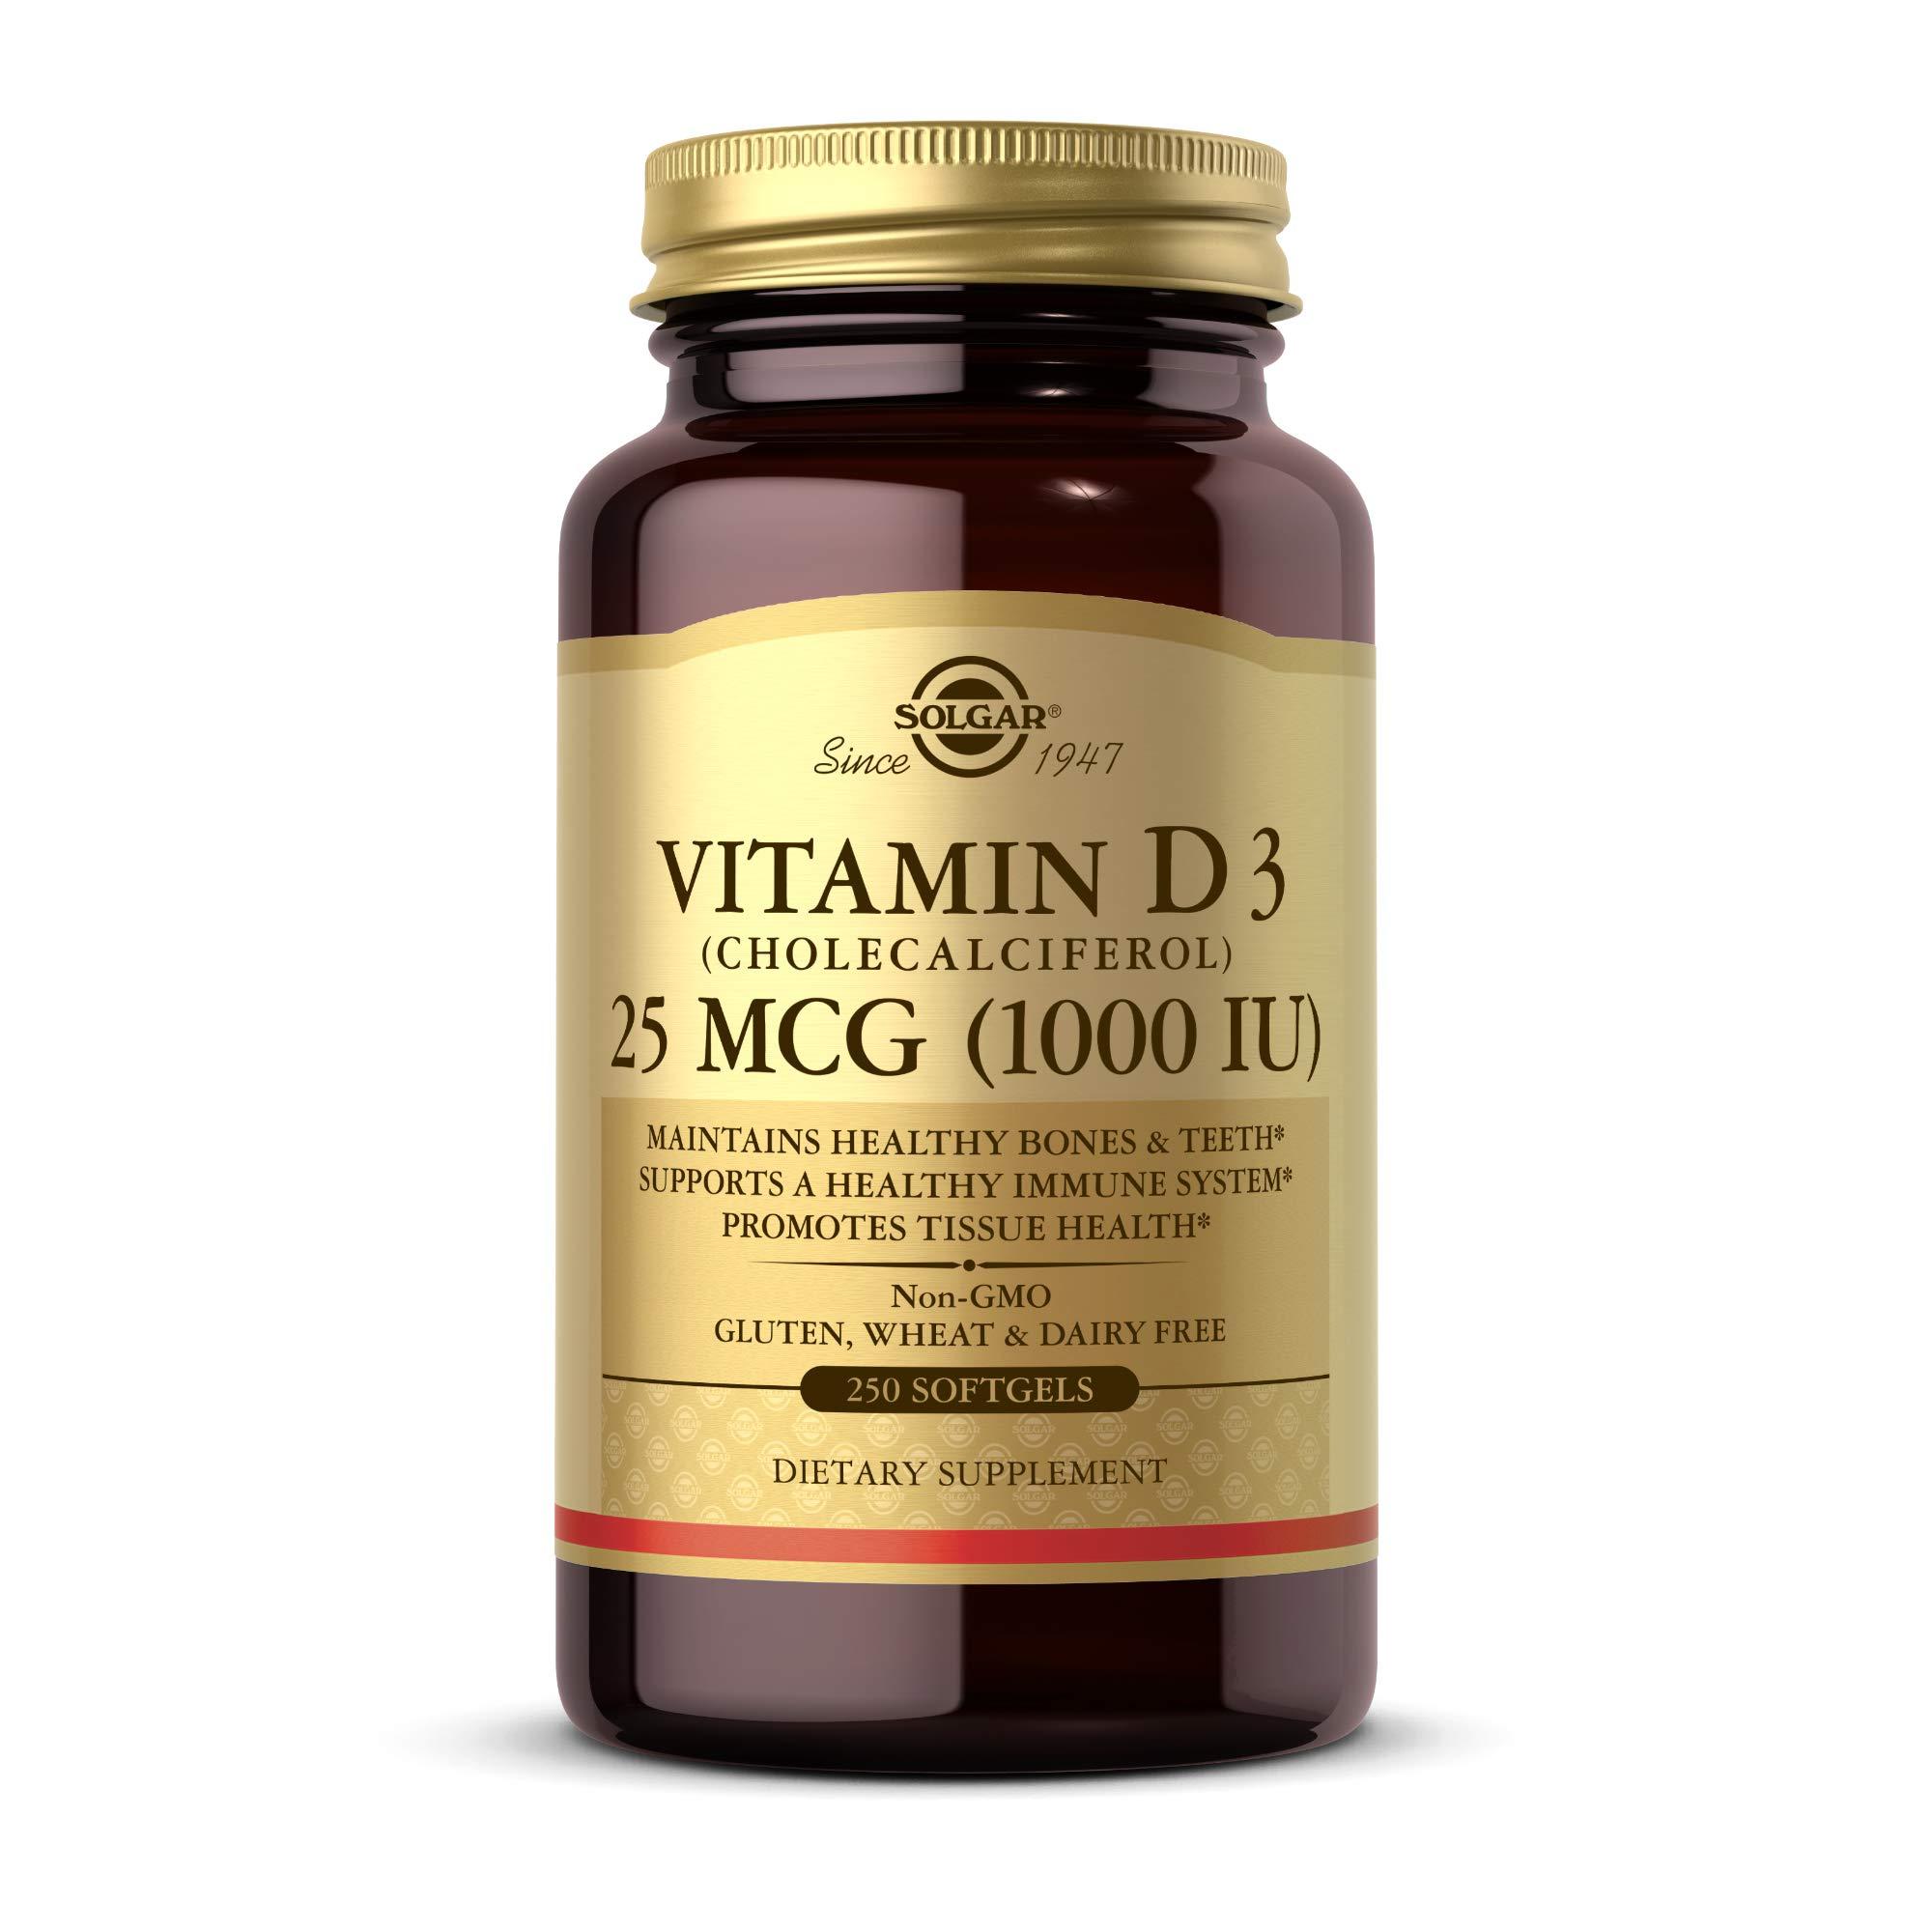 Solgar Vitamin D3 (Cholecalciferol) 25 MCG (1000 IU), 250 Softgels - Helps Maintain Healthy Bones & Teeth - Immune System Support - Non-GMO, Gluten Free, Dairy Free - 250 Servings